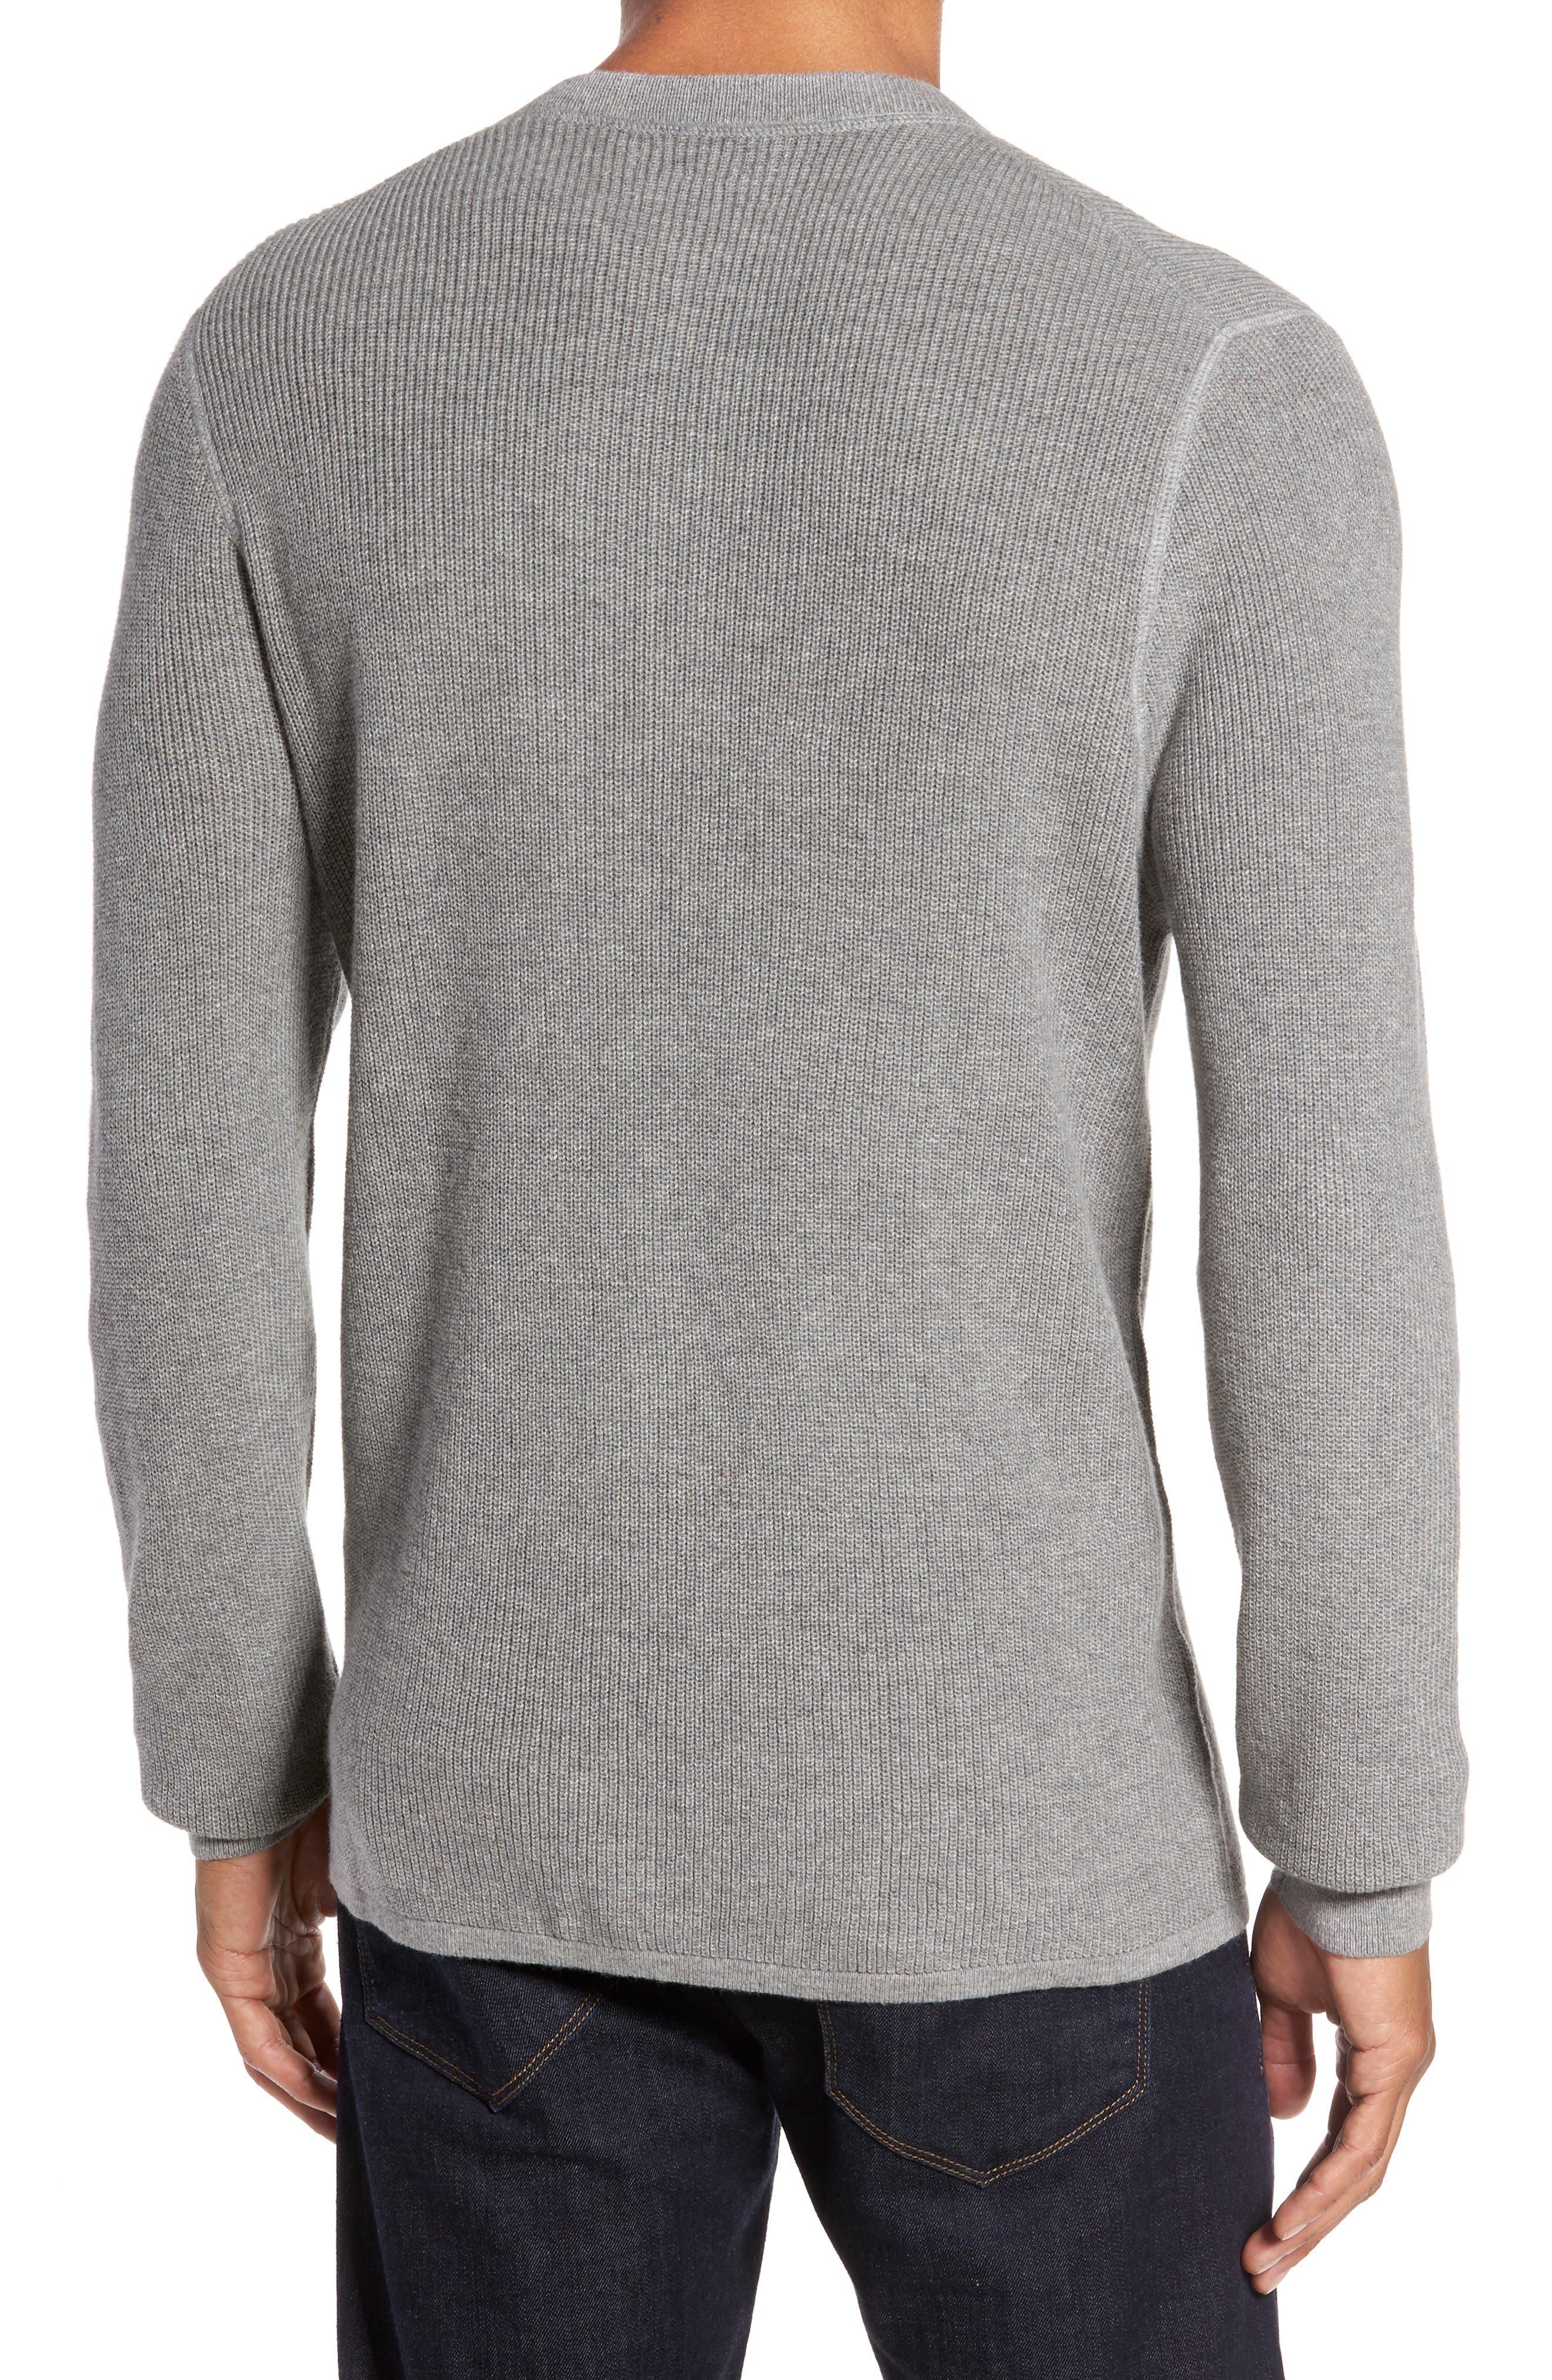 Cotton & Cashmere Henley Sweater,                             Alternate thumbnail 2, color,                             030